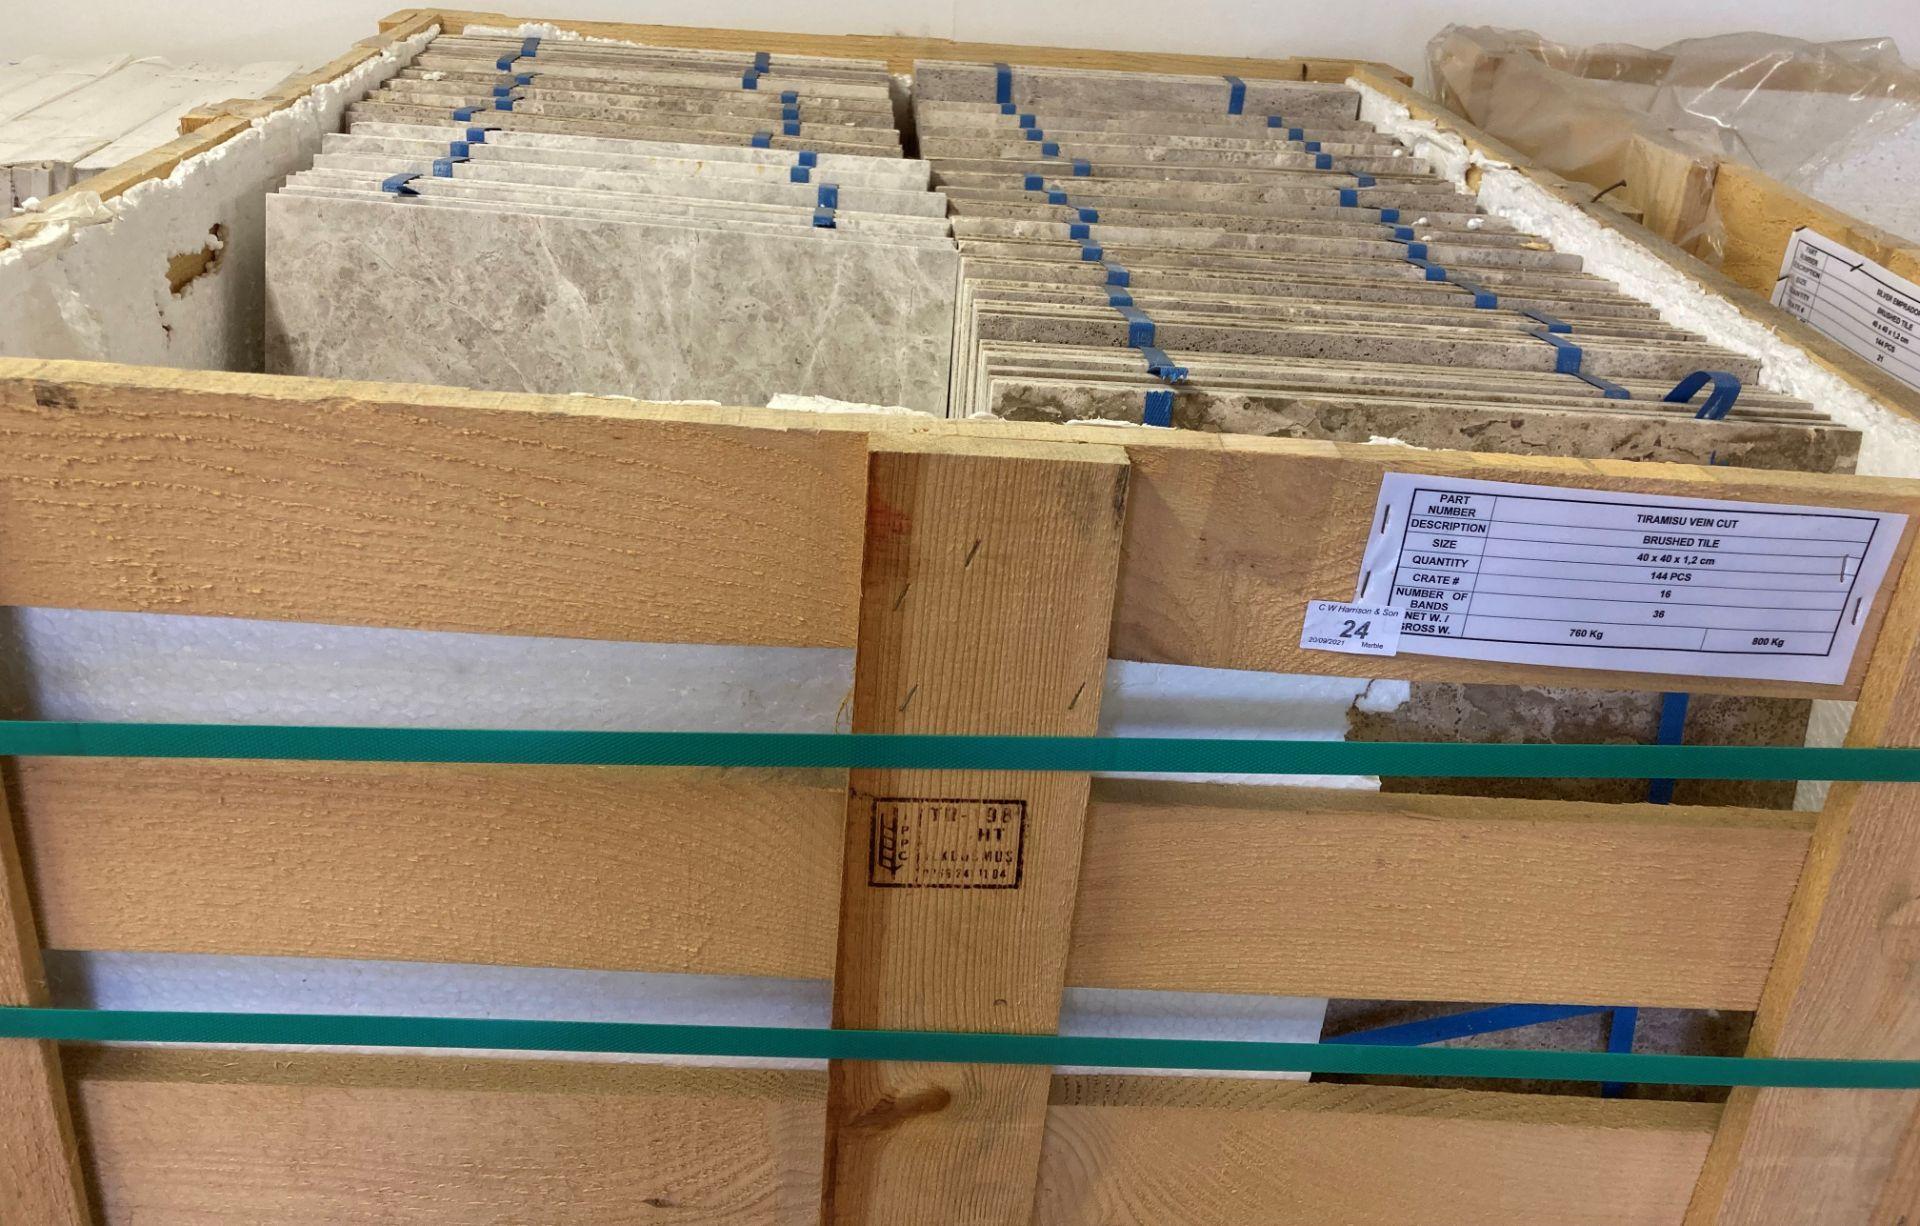 22 x packs of 4 marble tiramisu vein cut brushed tiles - 40 x 40 x 1. - Image 2 of 2